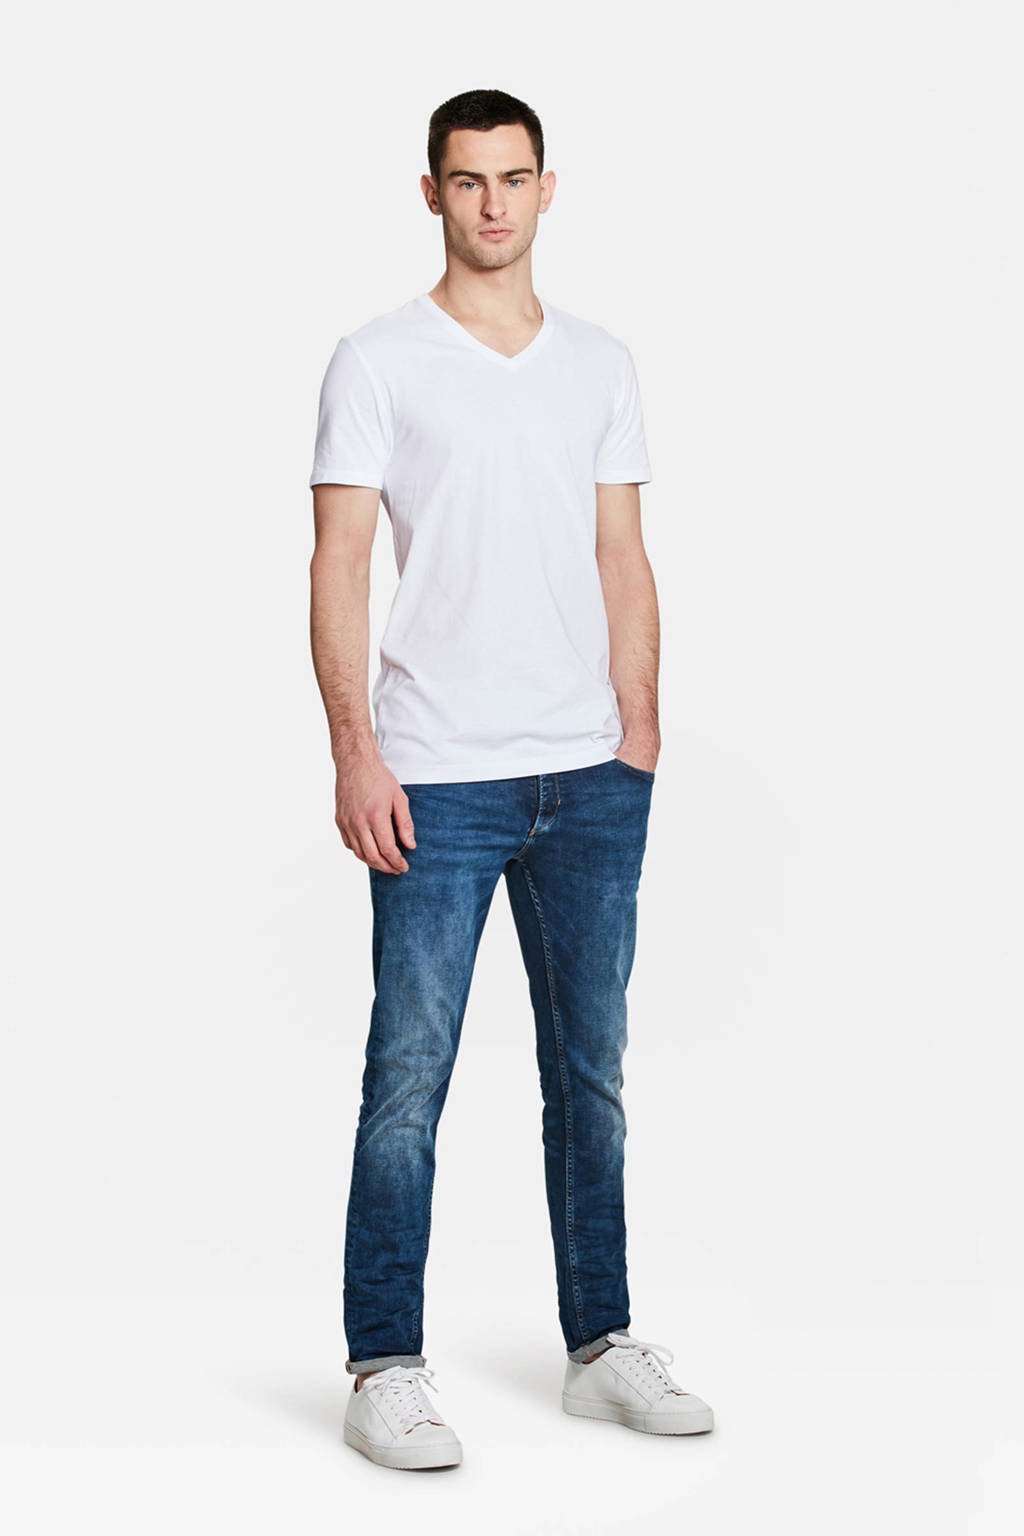 WE Fashion Fundamental T-shirt white uni, White Uni